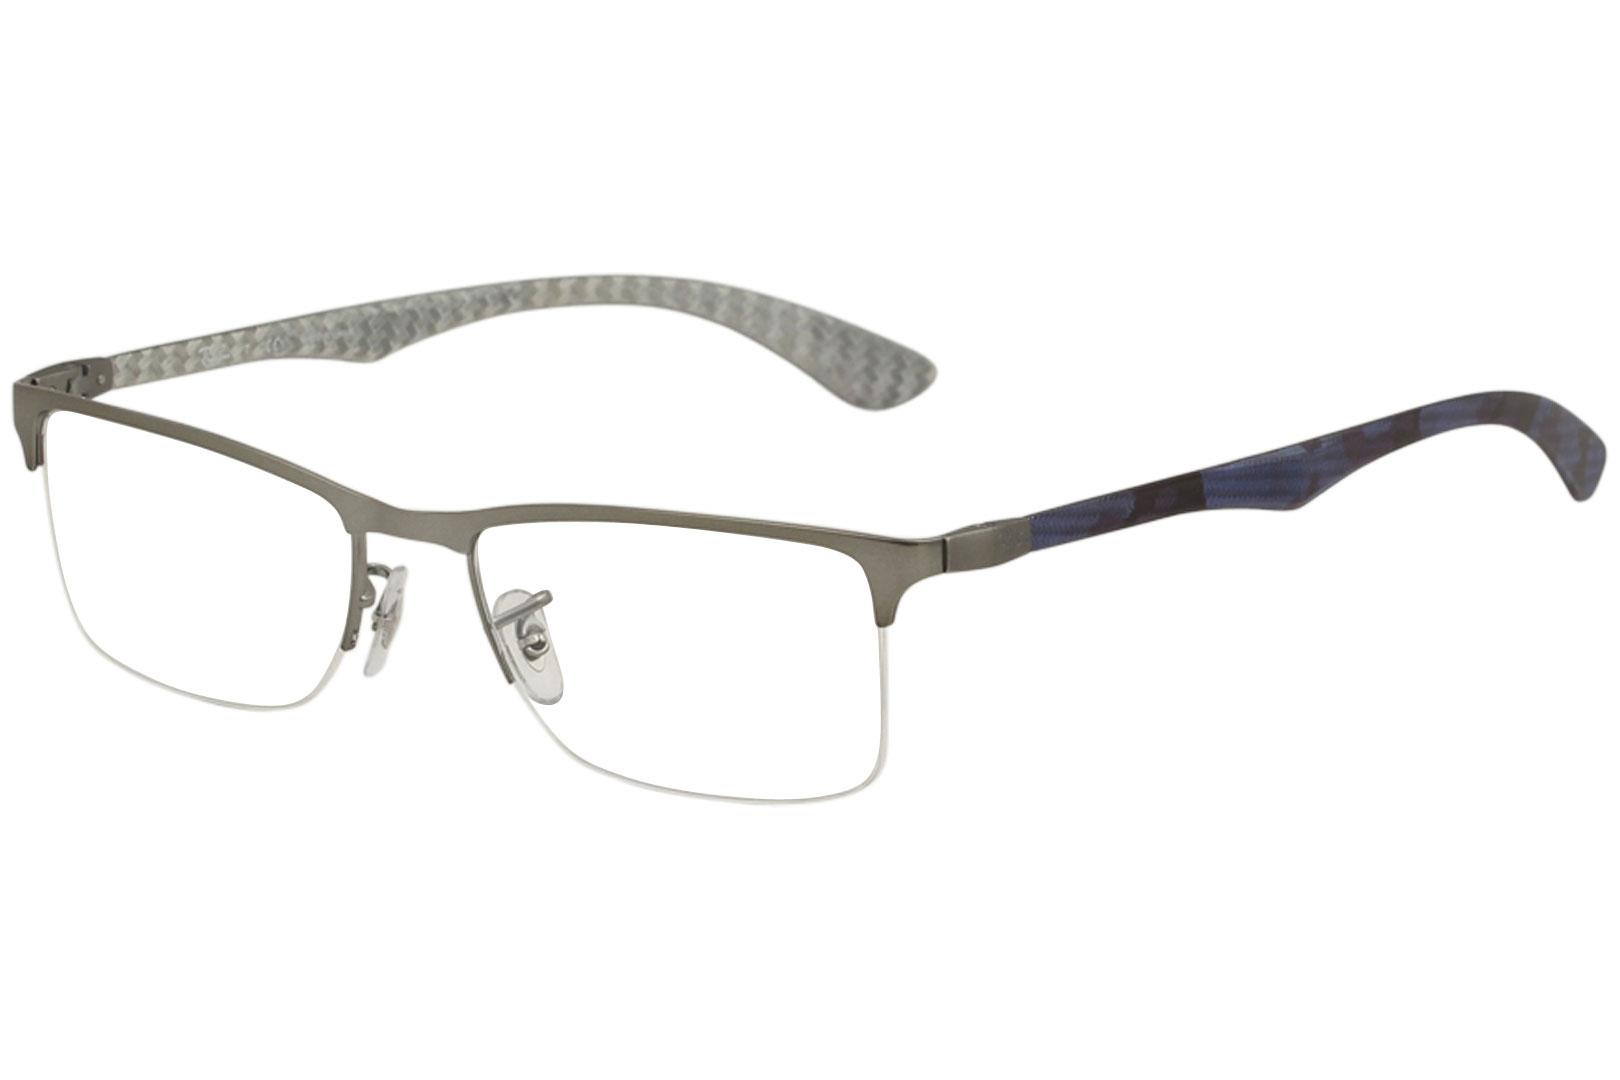 fa59d75ff4 Ray-Ban Men s Eyeglasses RX8413 RX 8413 RayBan Half Rim Optical Frame